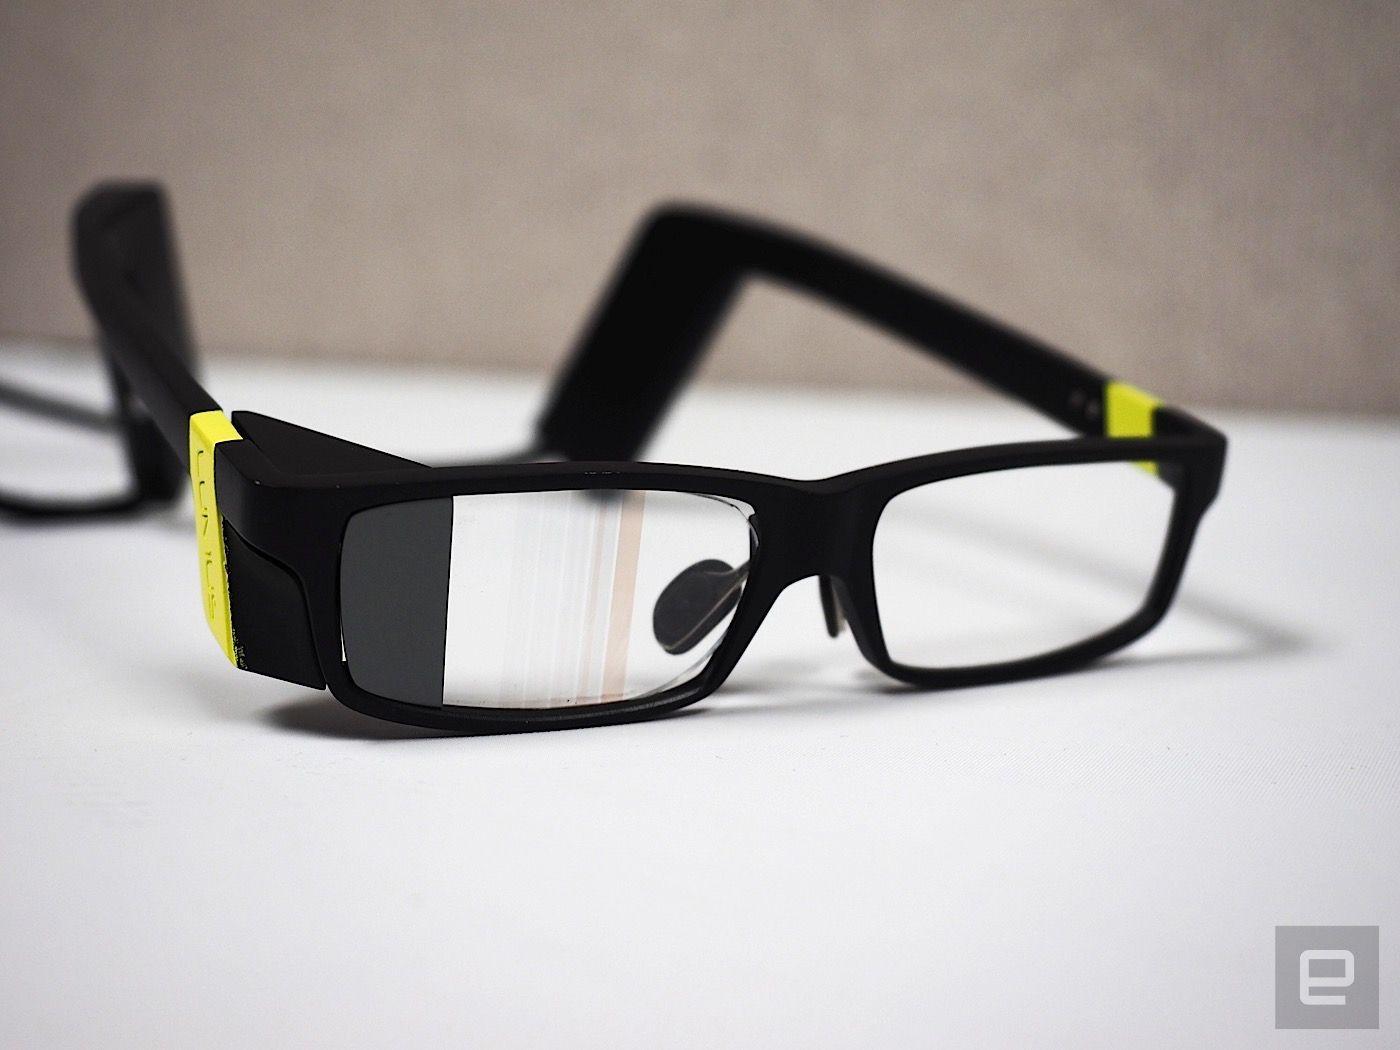 edcceefcbf36 Lumus wants its display optics in future smart glasses